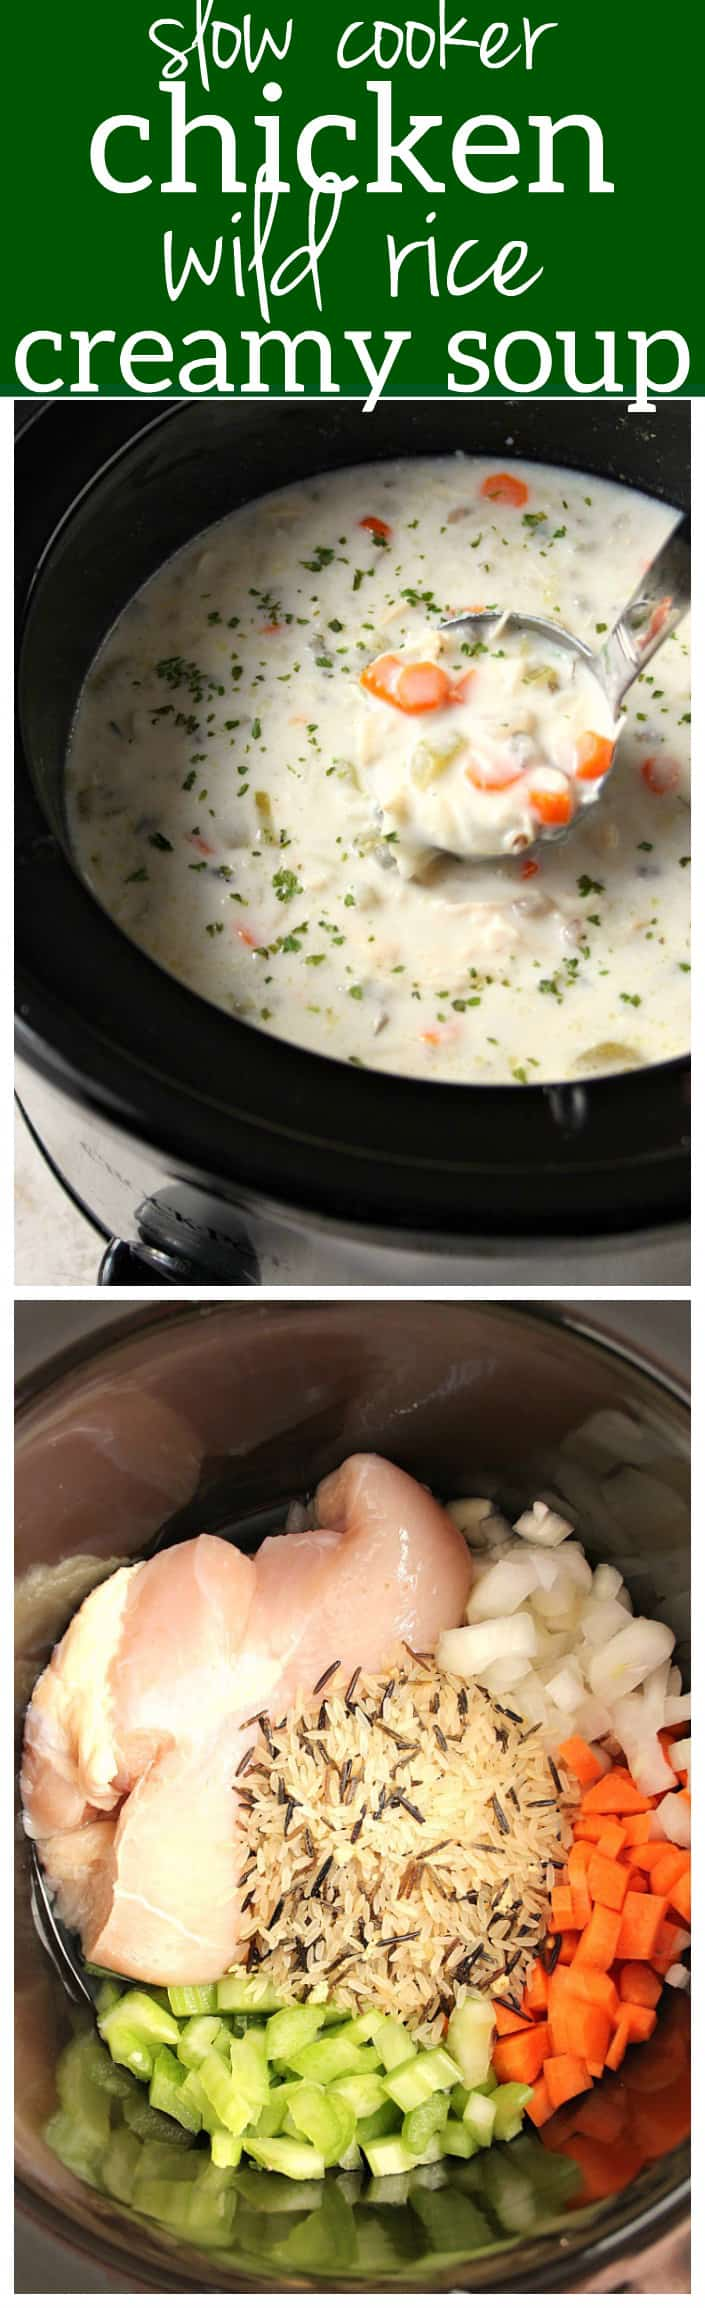 crock pot rice cooker instructions